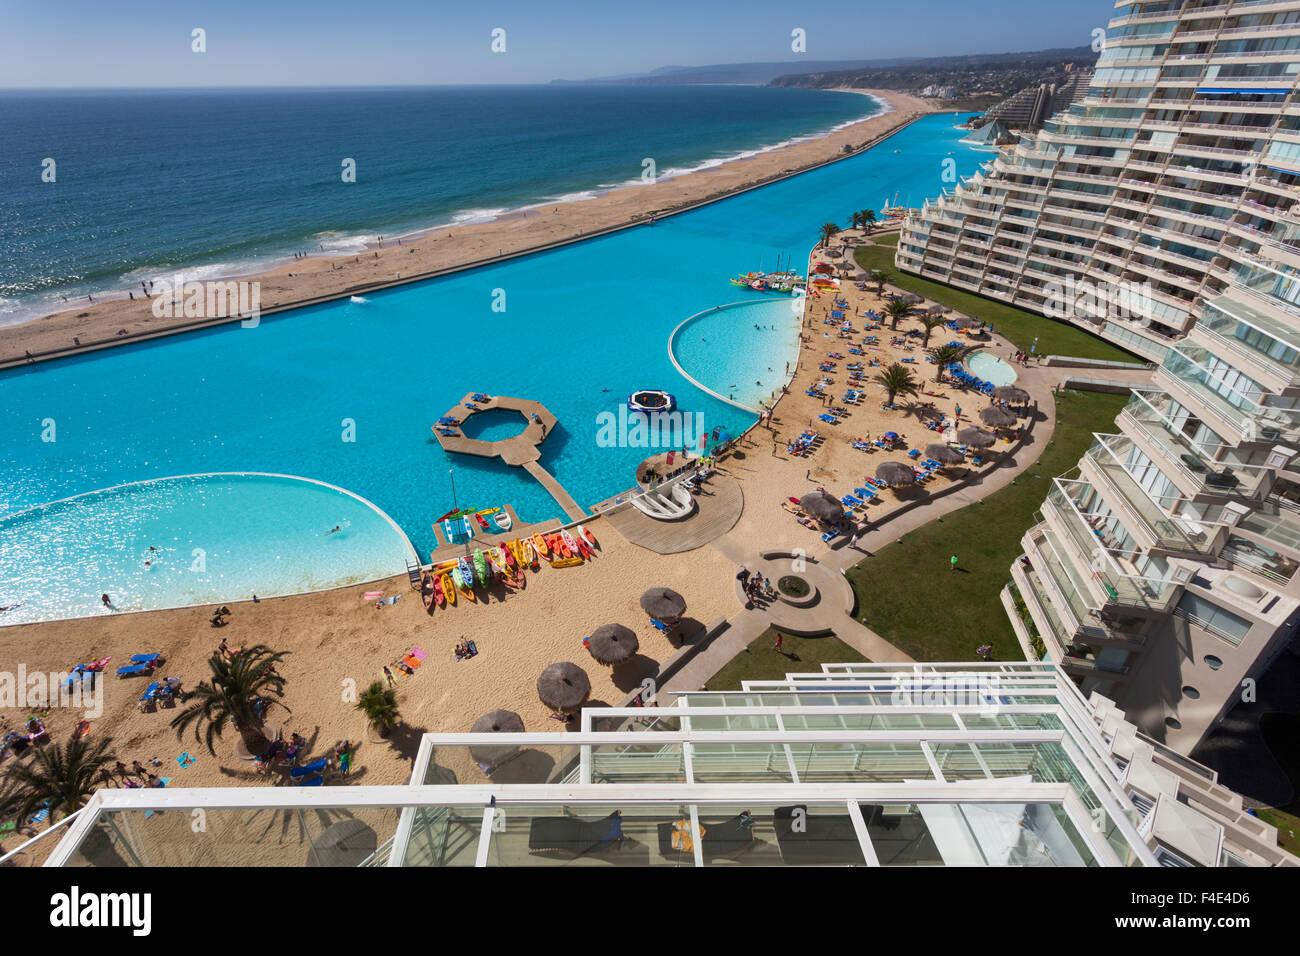 San Alfonso Del Mar Resort >> Chile Algarrobo San Alfonso Del Mar Resort Has The World S